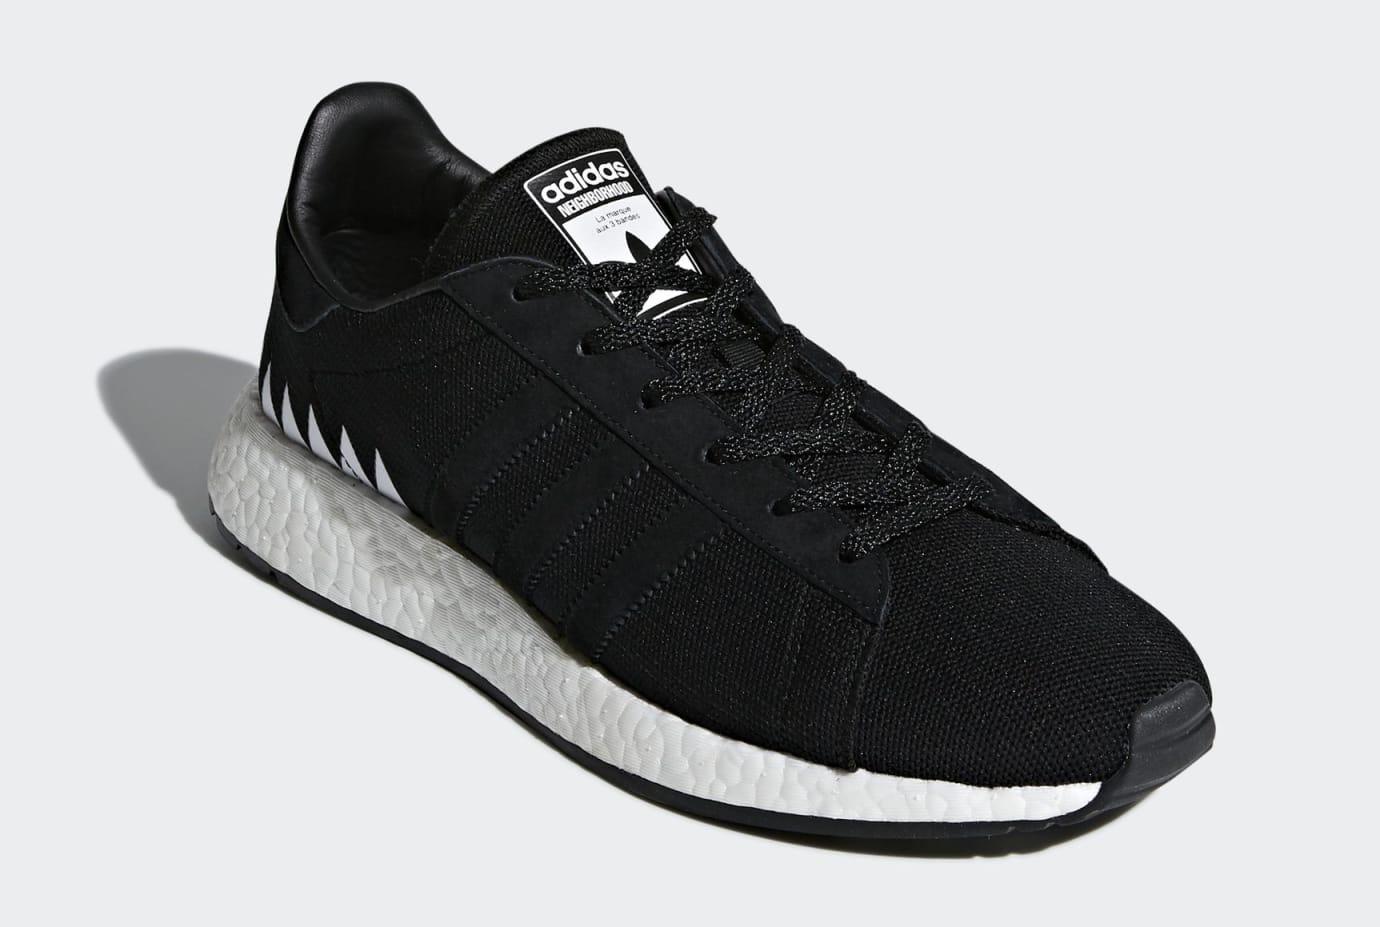 Neighborhood x Adidas Chop Shop DA8839 (Angle)